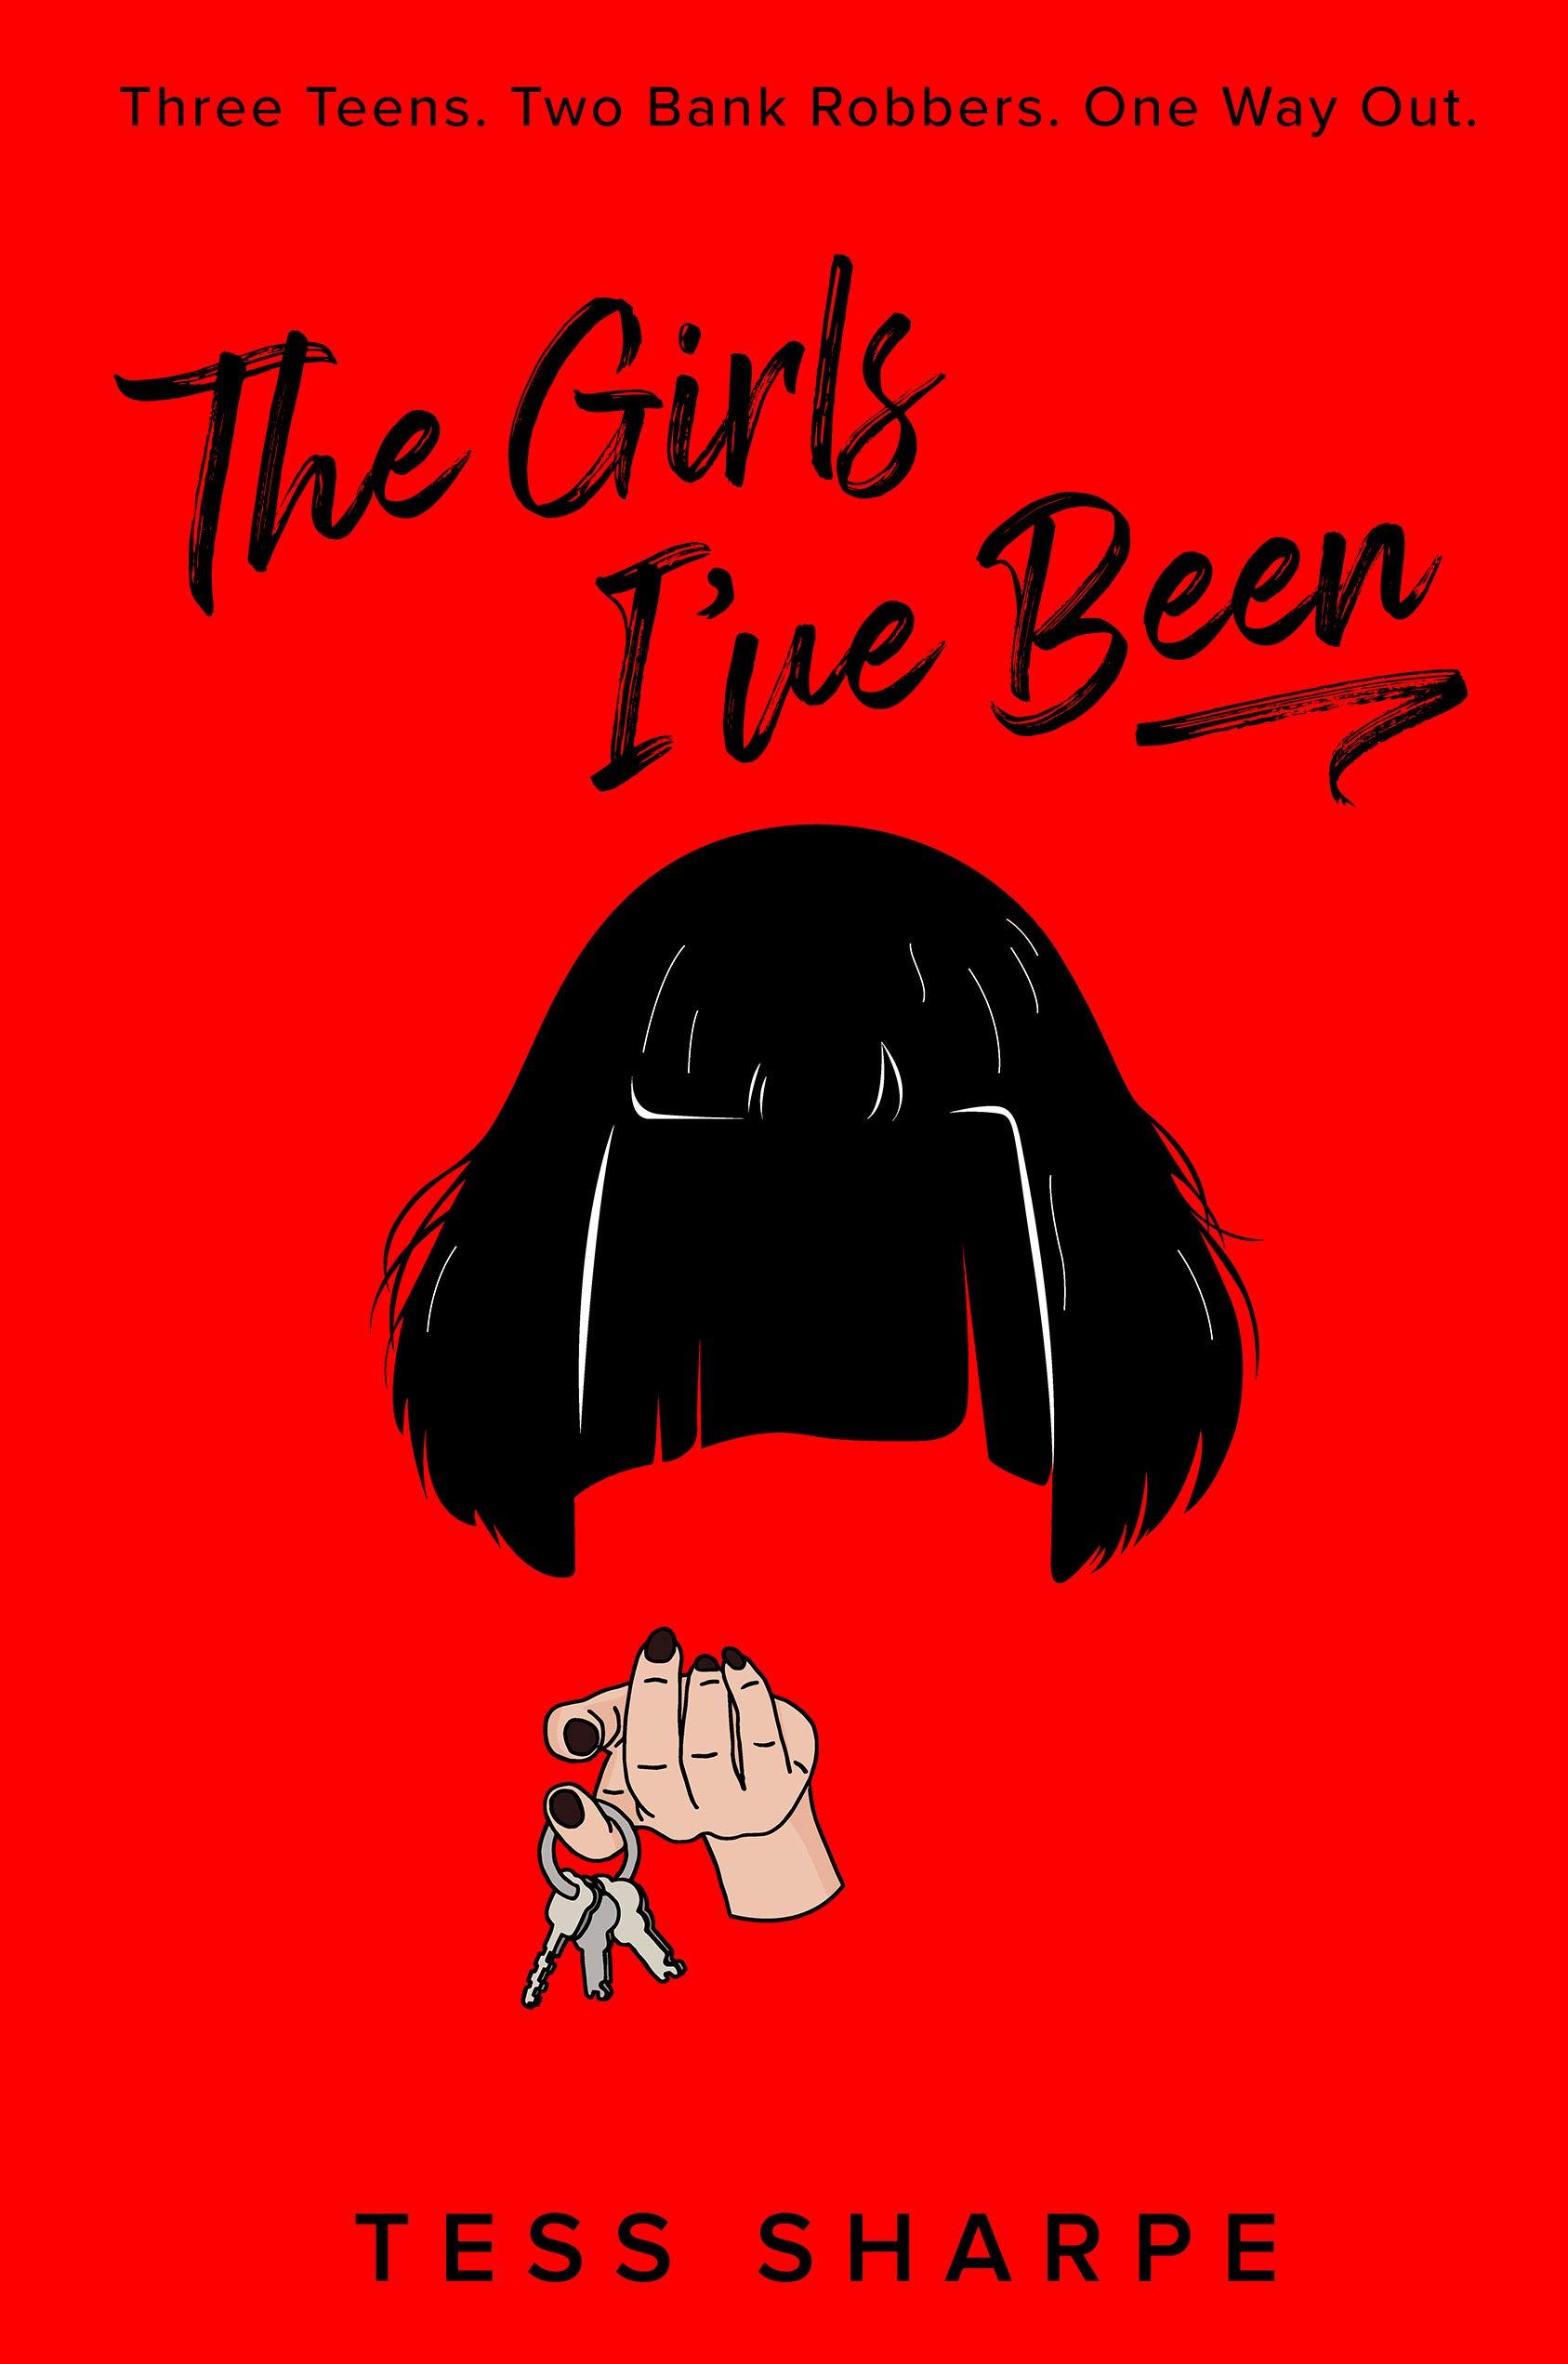 Amazon.com: The Girls I've Been (9780593353806): Sharpe, Tess: Books